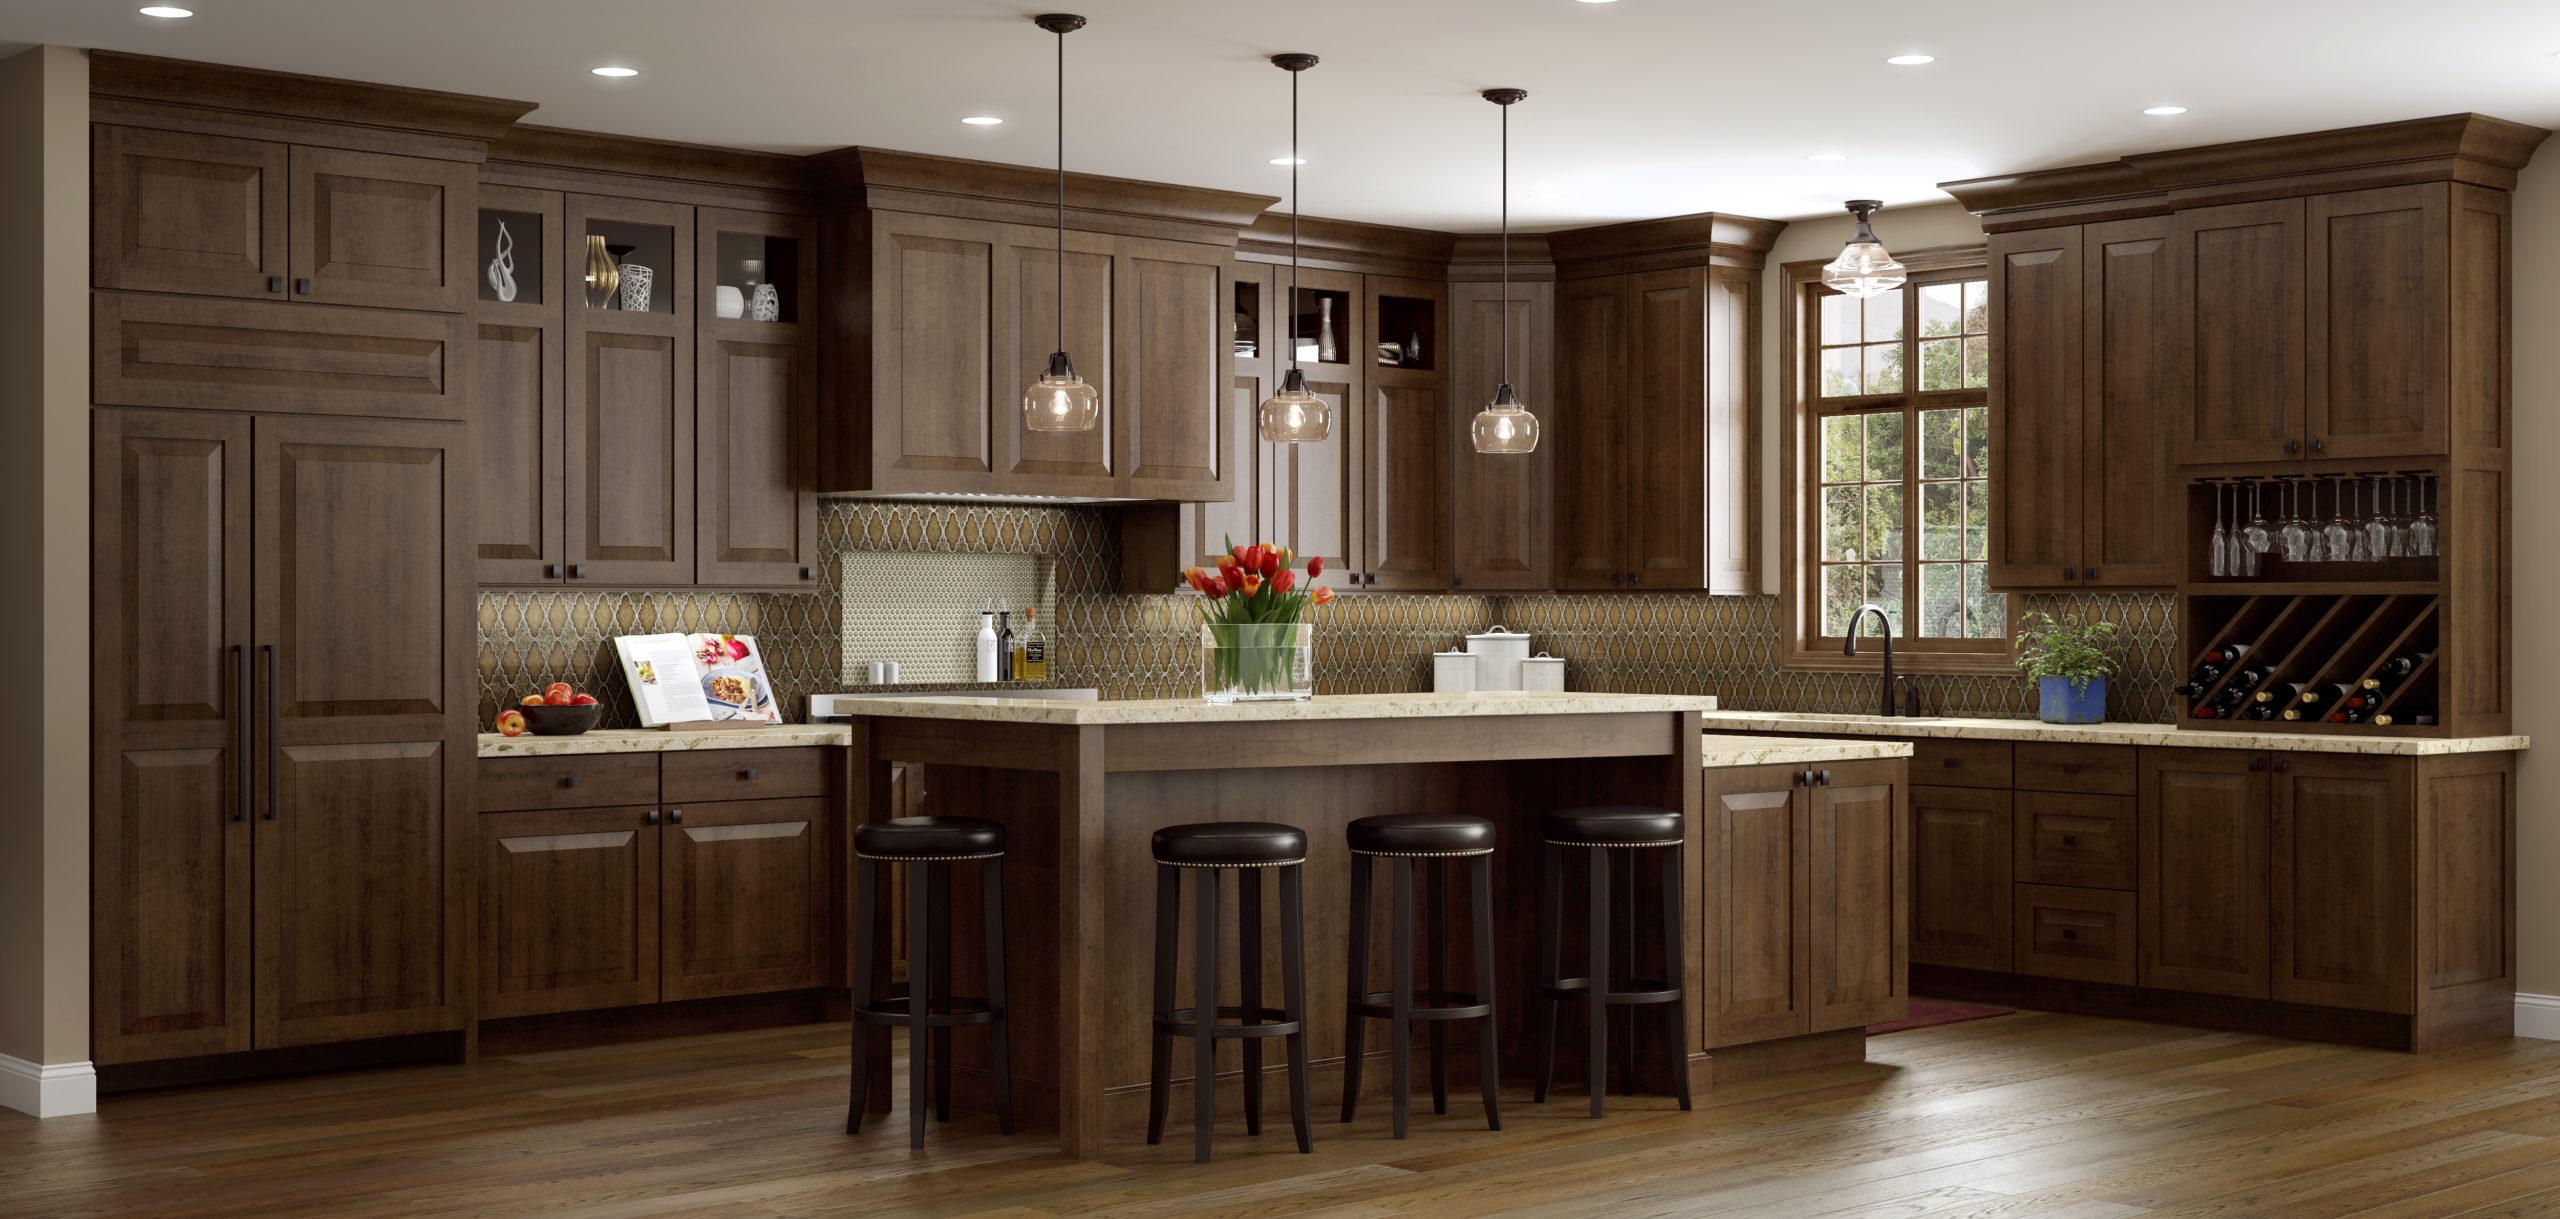 Kitchen design cary nc 28 images bathroom remodel for V kitchen in durham nc